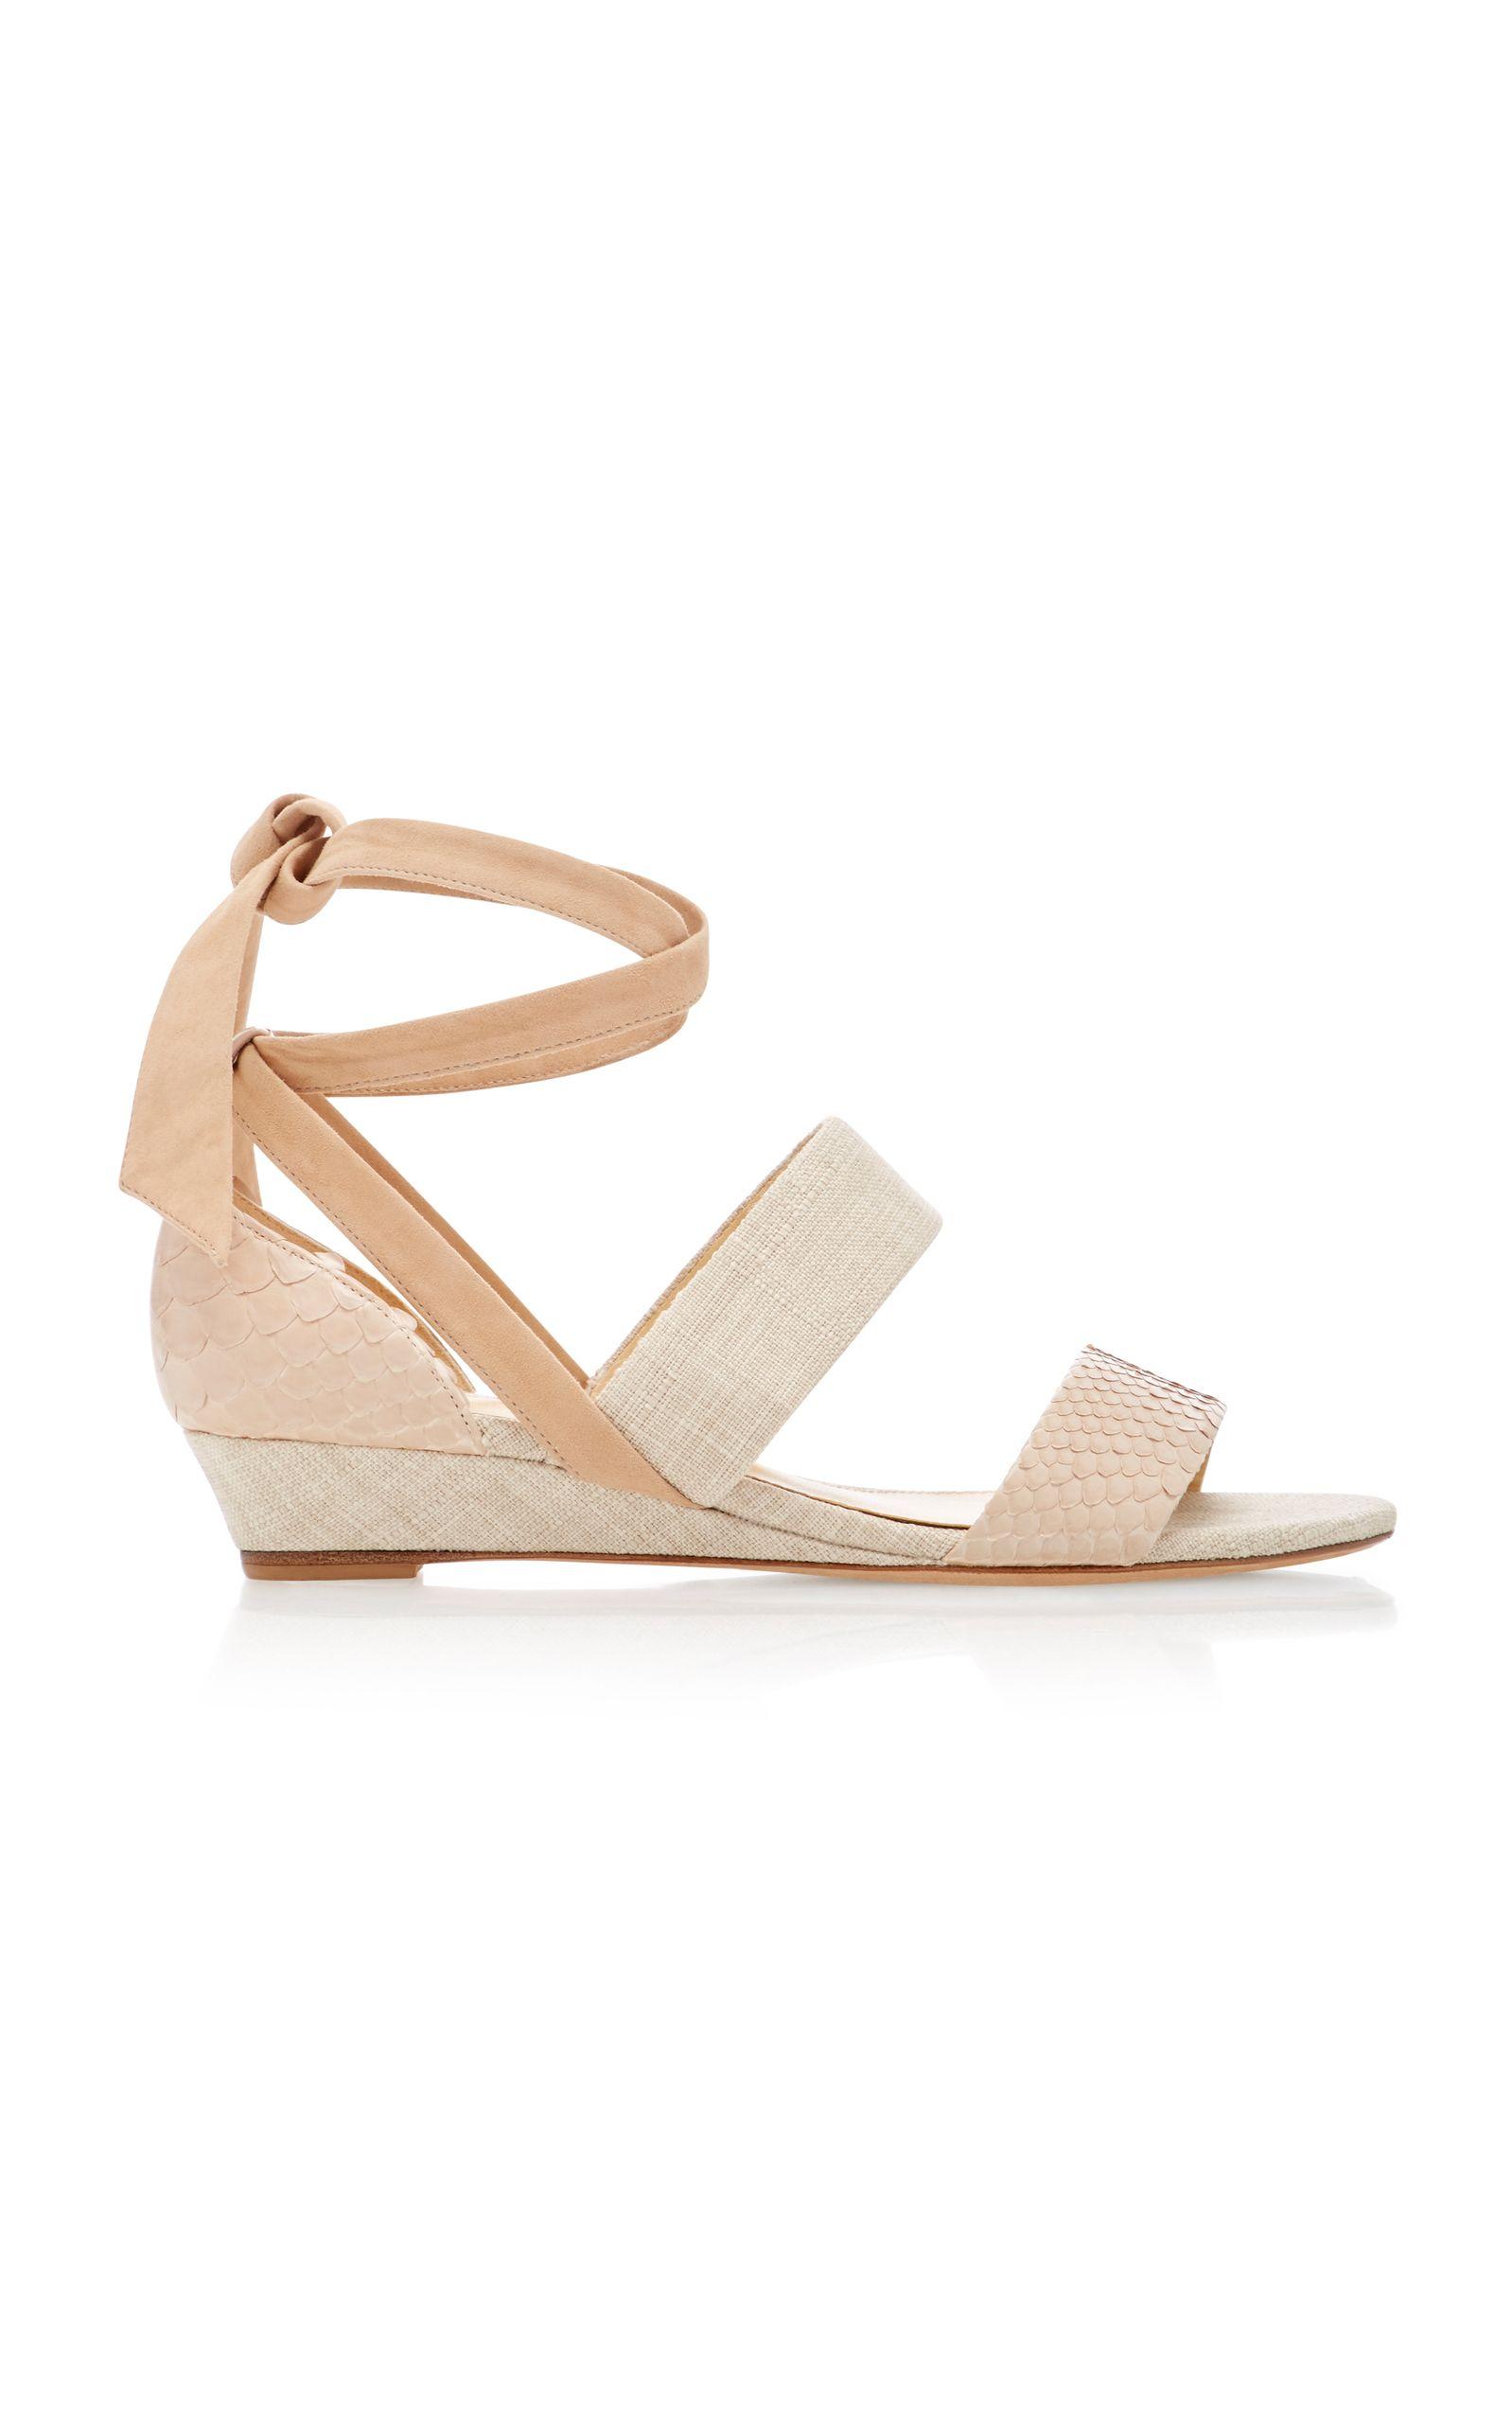 a06294ab6ec ALEXANDRE BIRMAN NEW YANNA PYTHON CANVAS AND SUEDE WEDGE SANDALS.   alexandrebirman  shoes